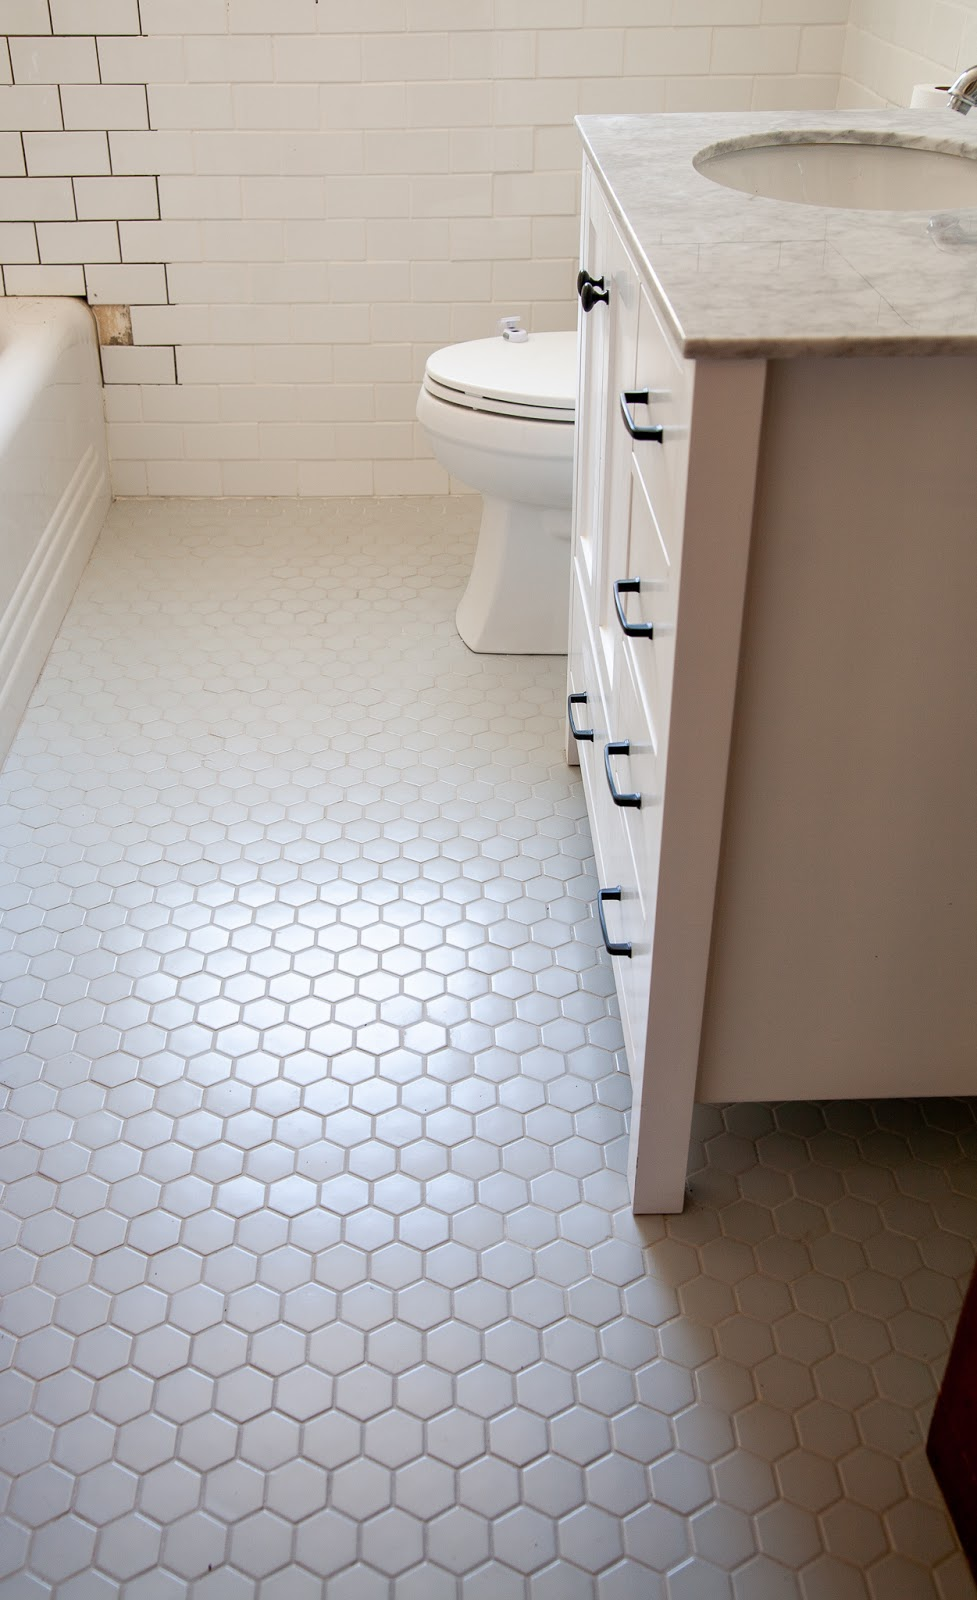 How To Lay Mosaic Tile Flooring Week 2 One Room Challenge Bathroom Reno With Hexagon Floor Create Enjoy